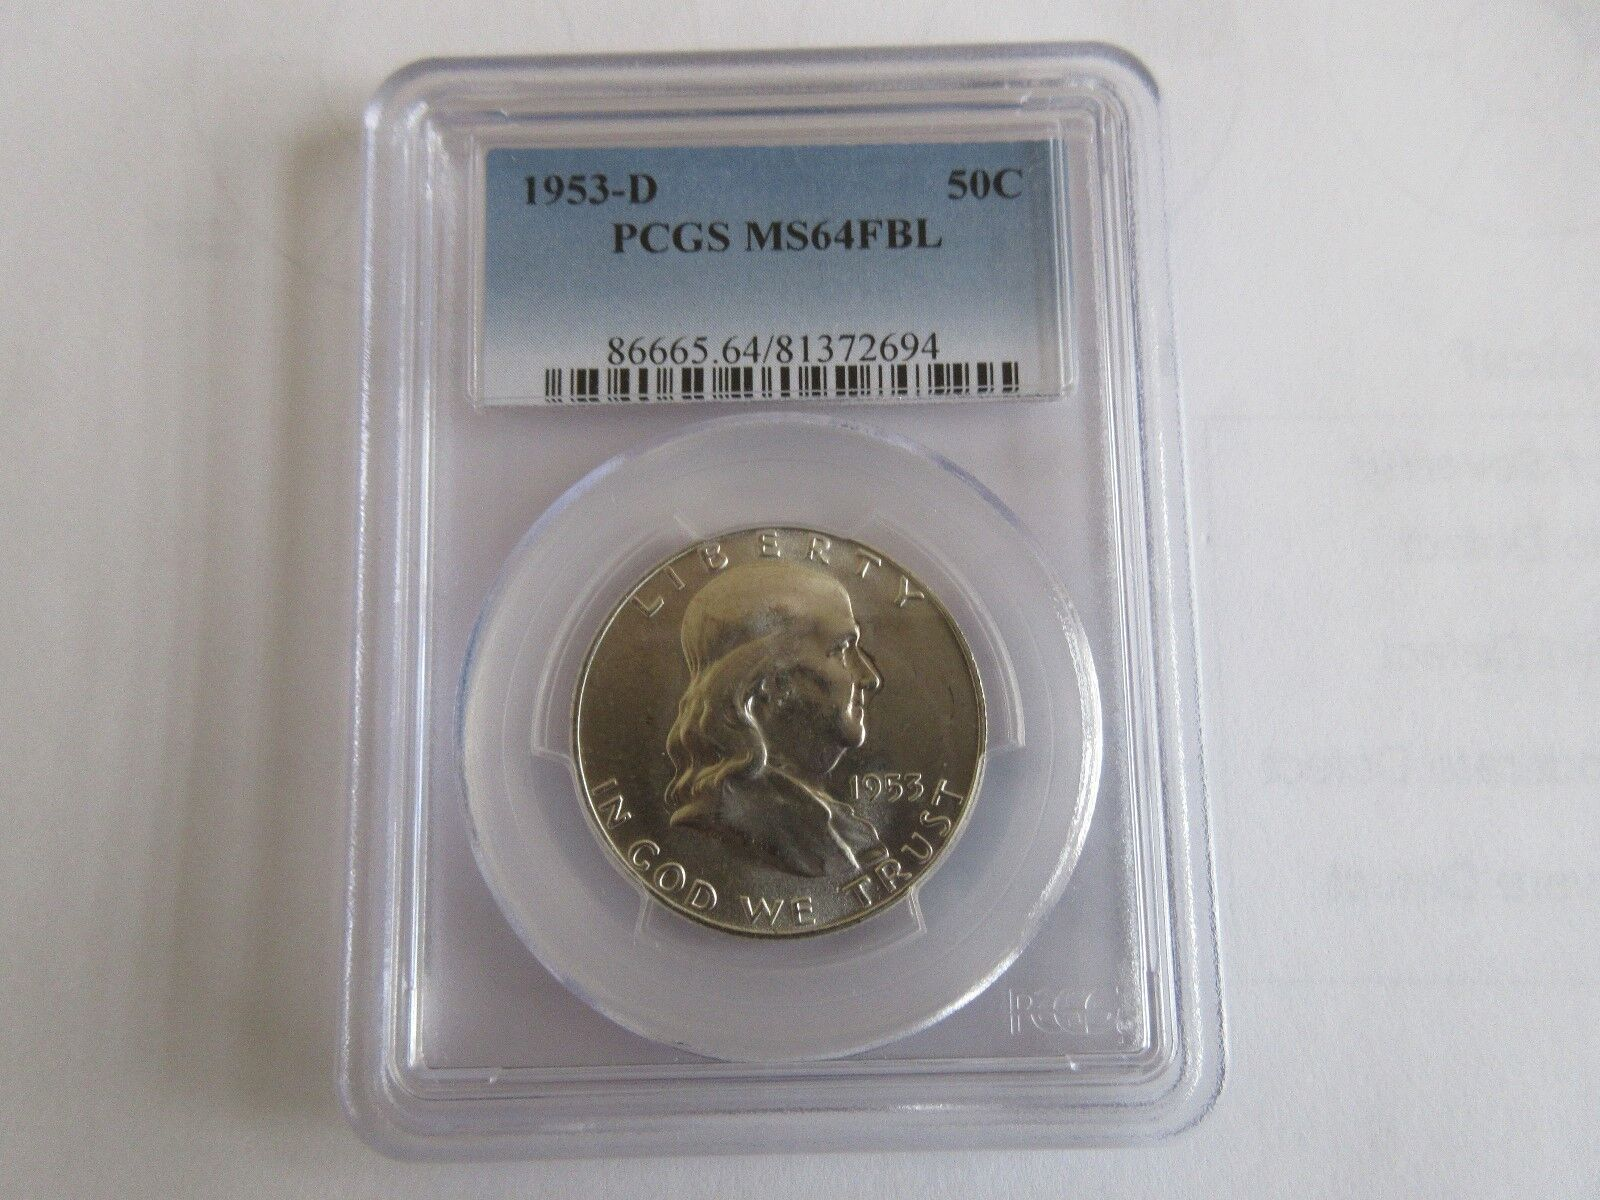 1953-D Franklin Half Dollar PCGS MS64FBL